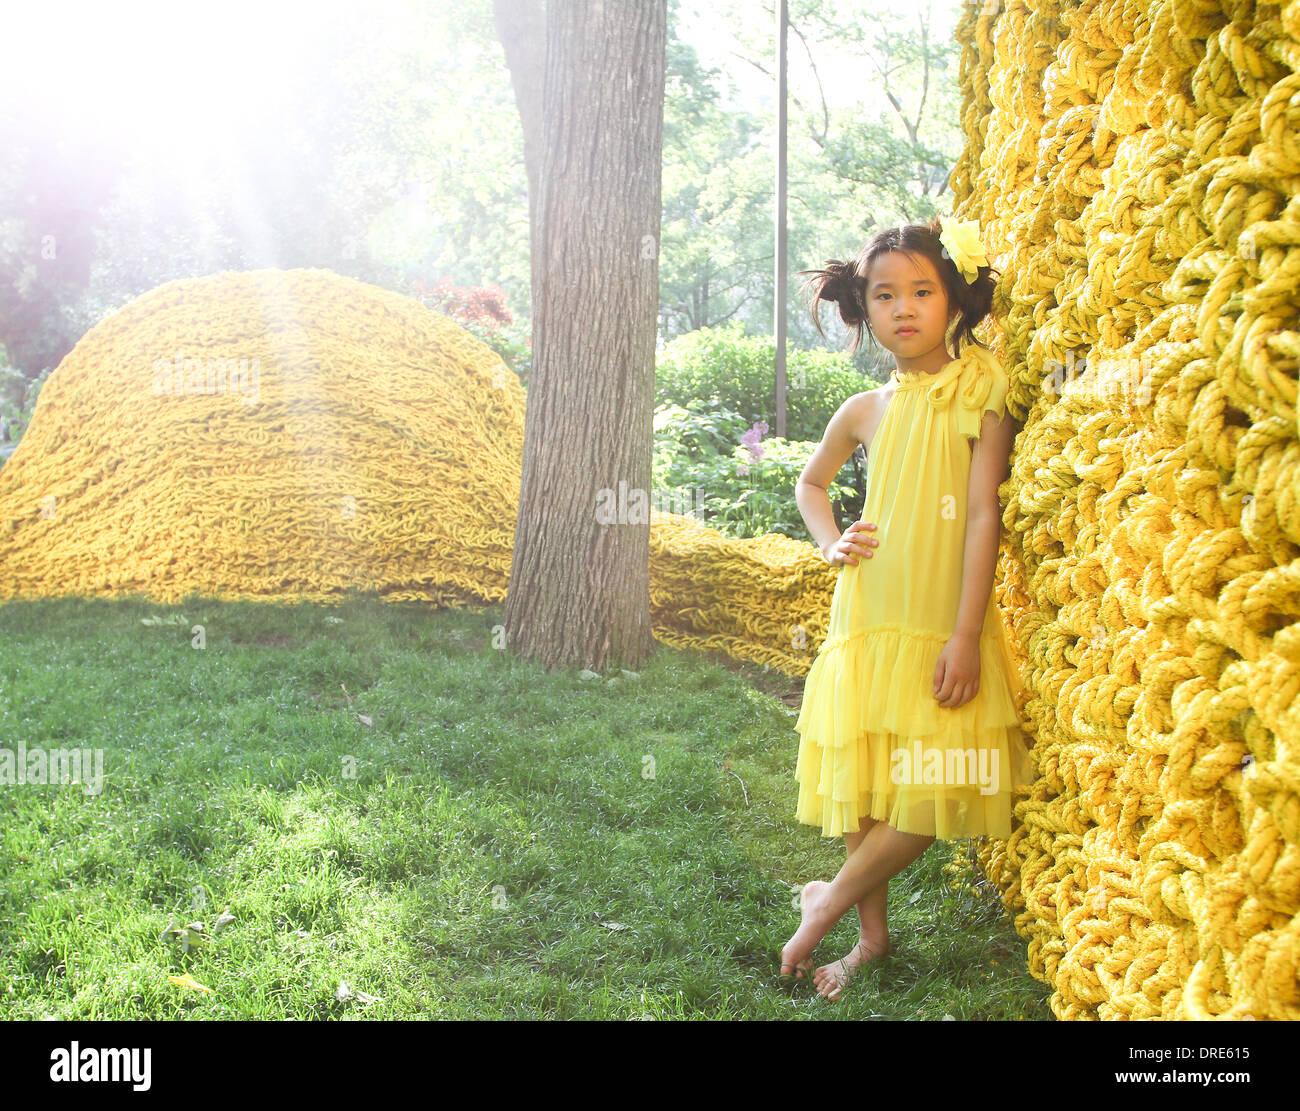 Young asian girl in yellow dress near yellow wall - Stock Image